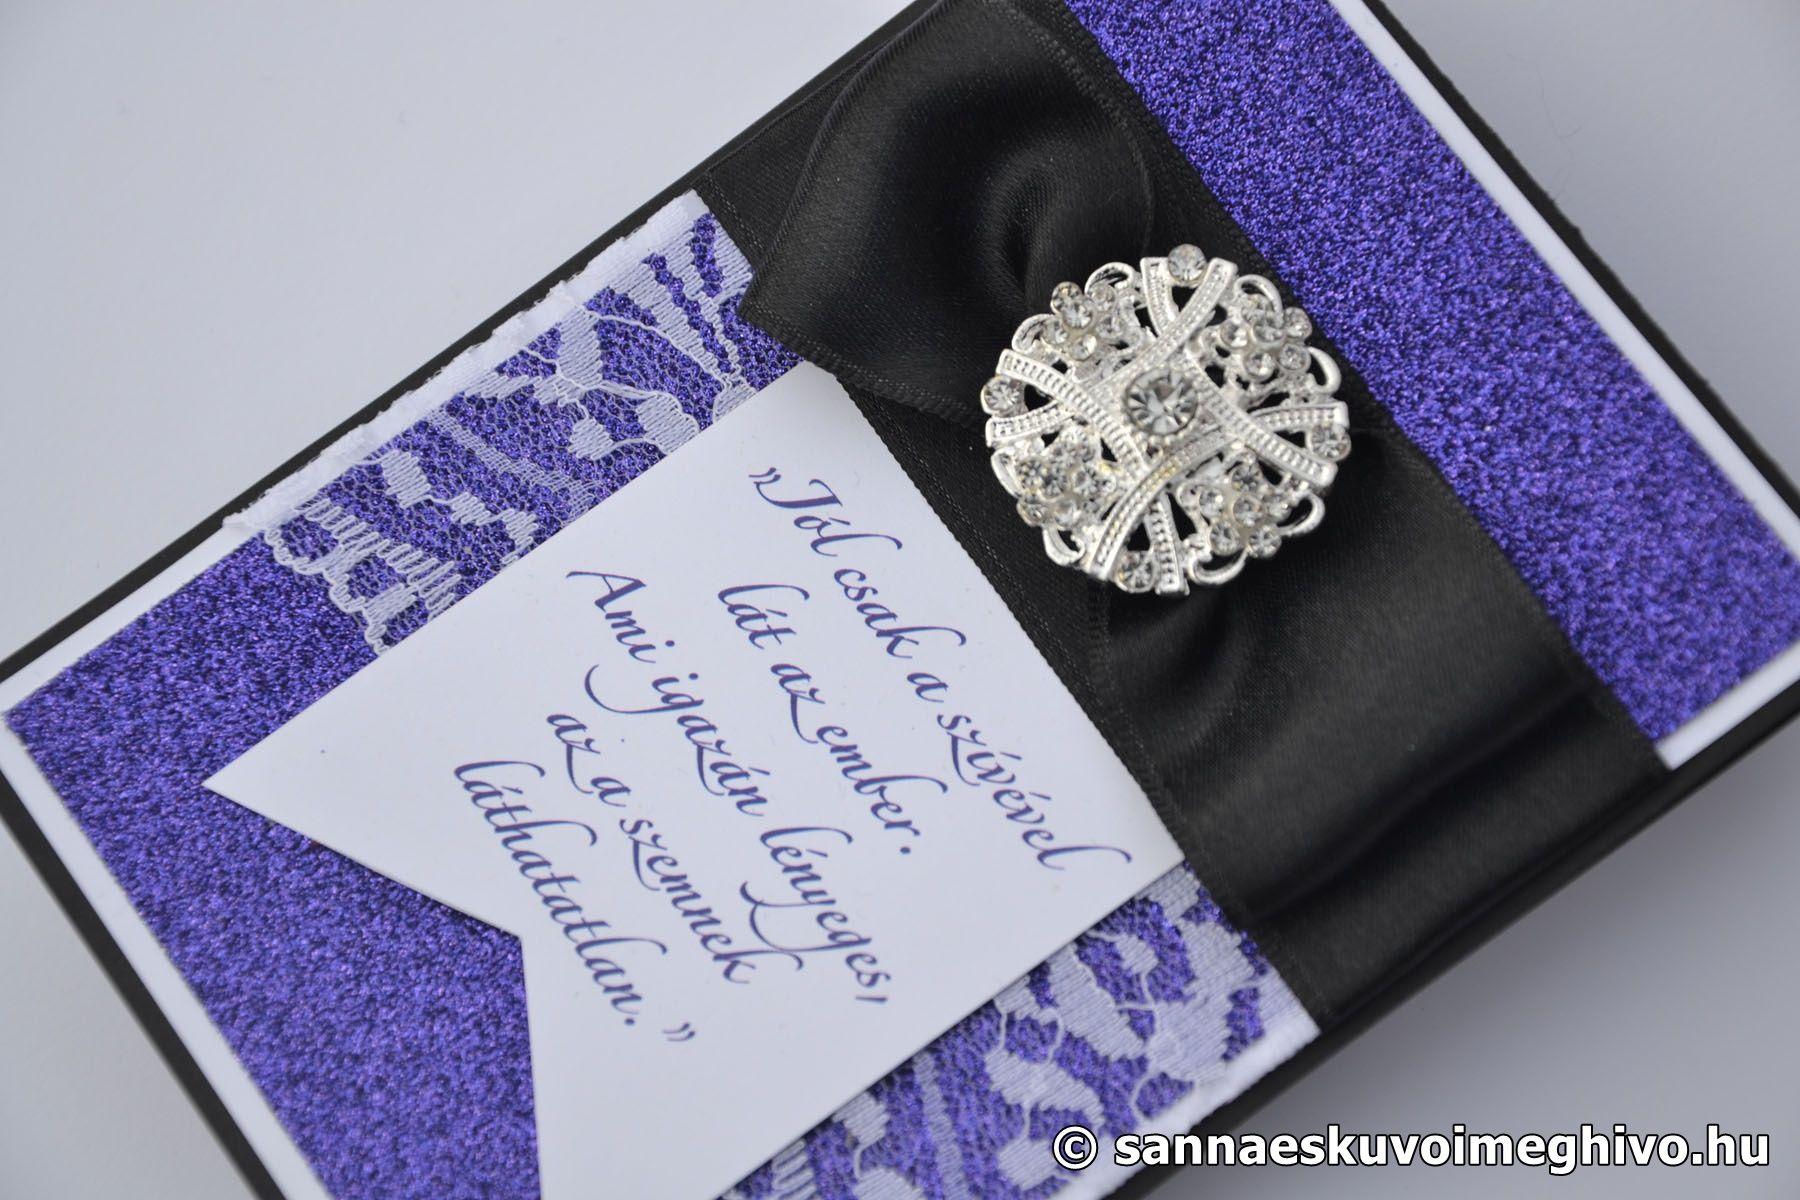 watch wedding invitation movie online eng sub%0A Csillog     larcosb  l esk  v  i megh  v    megh  v    strasszos esk  v  i megh  v     k  k esk  v  i megh  v    szalagos